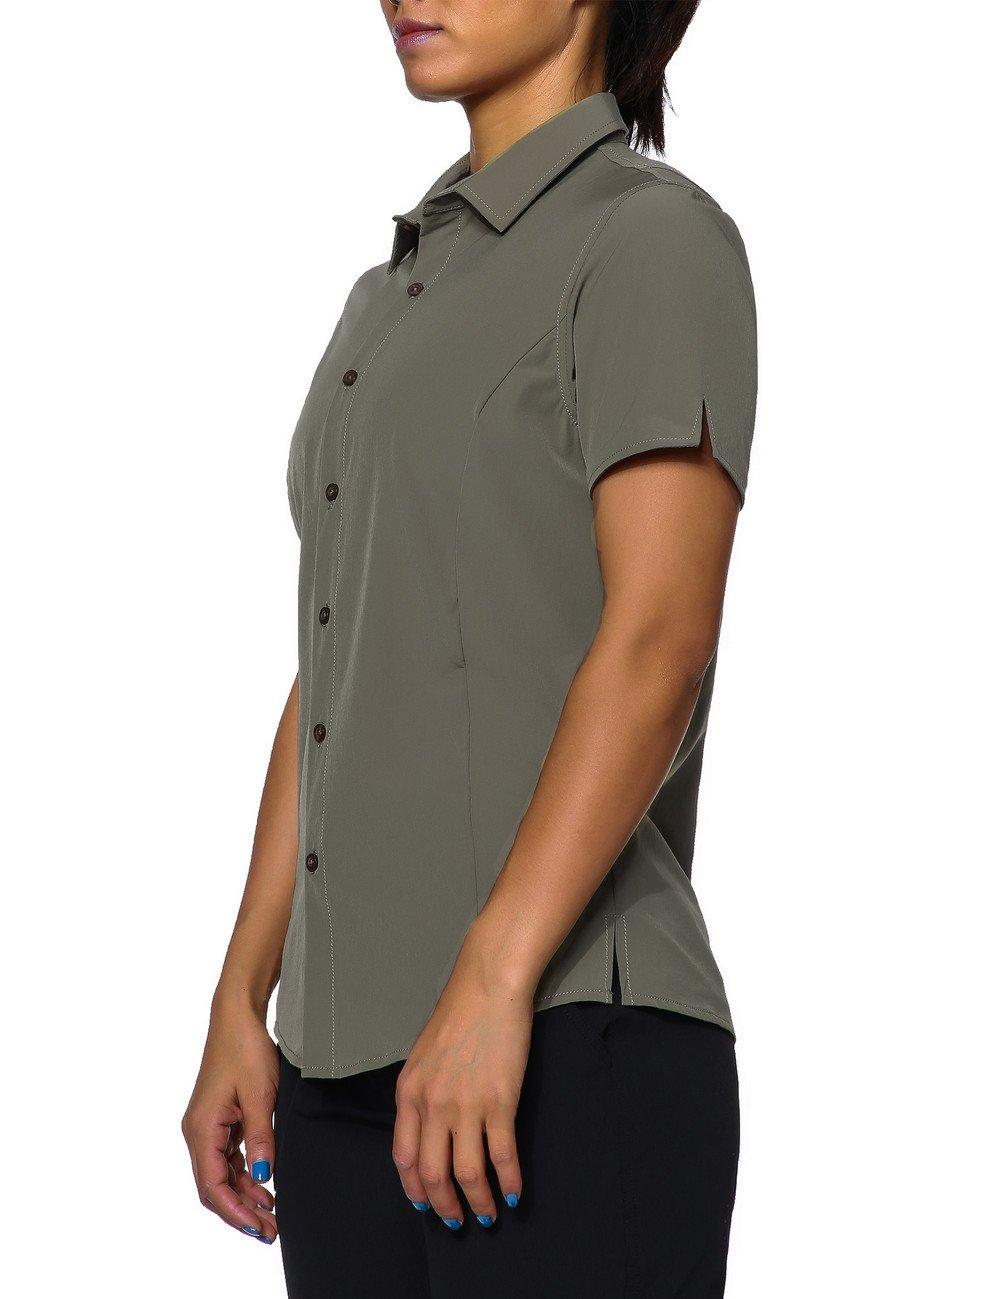 Unitop Womens Short-Sleeve Work Shirt Fishing Shirt for Hiking Camping